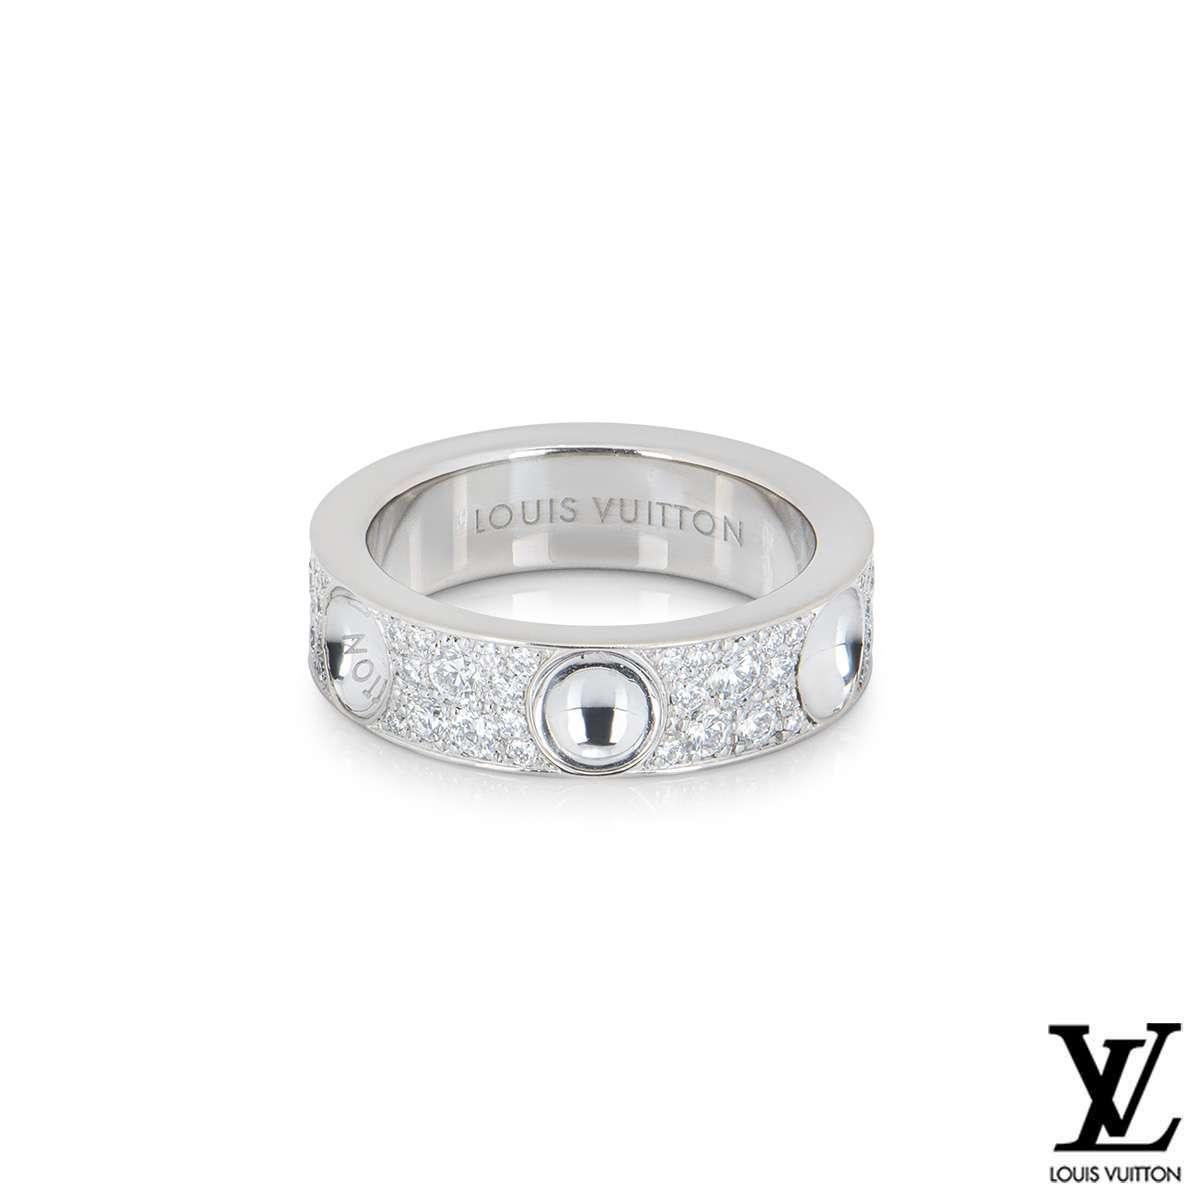 Louis Vuitton Empreinte Diamond Ring Q9A01A